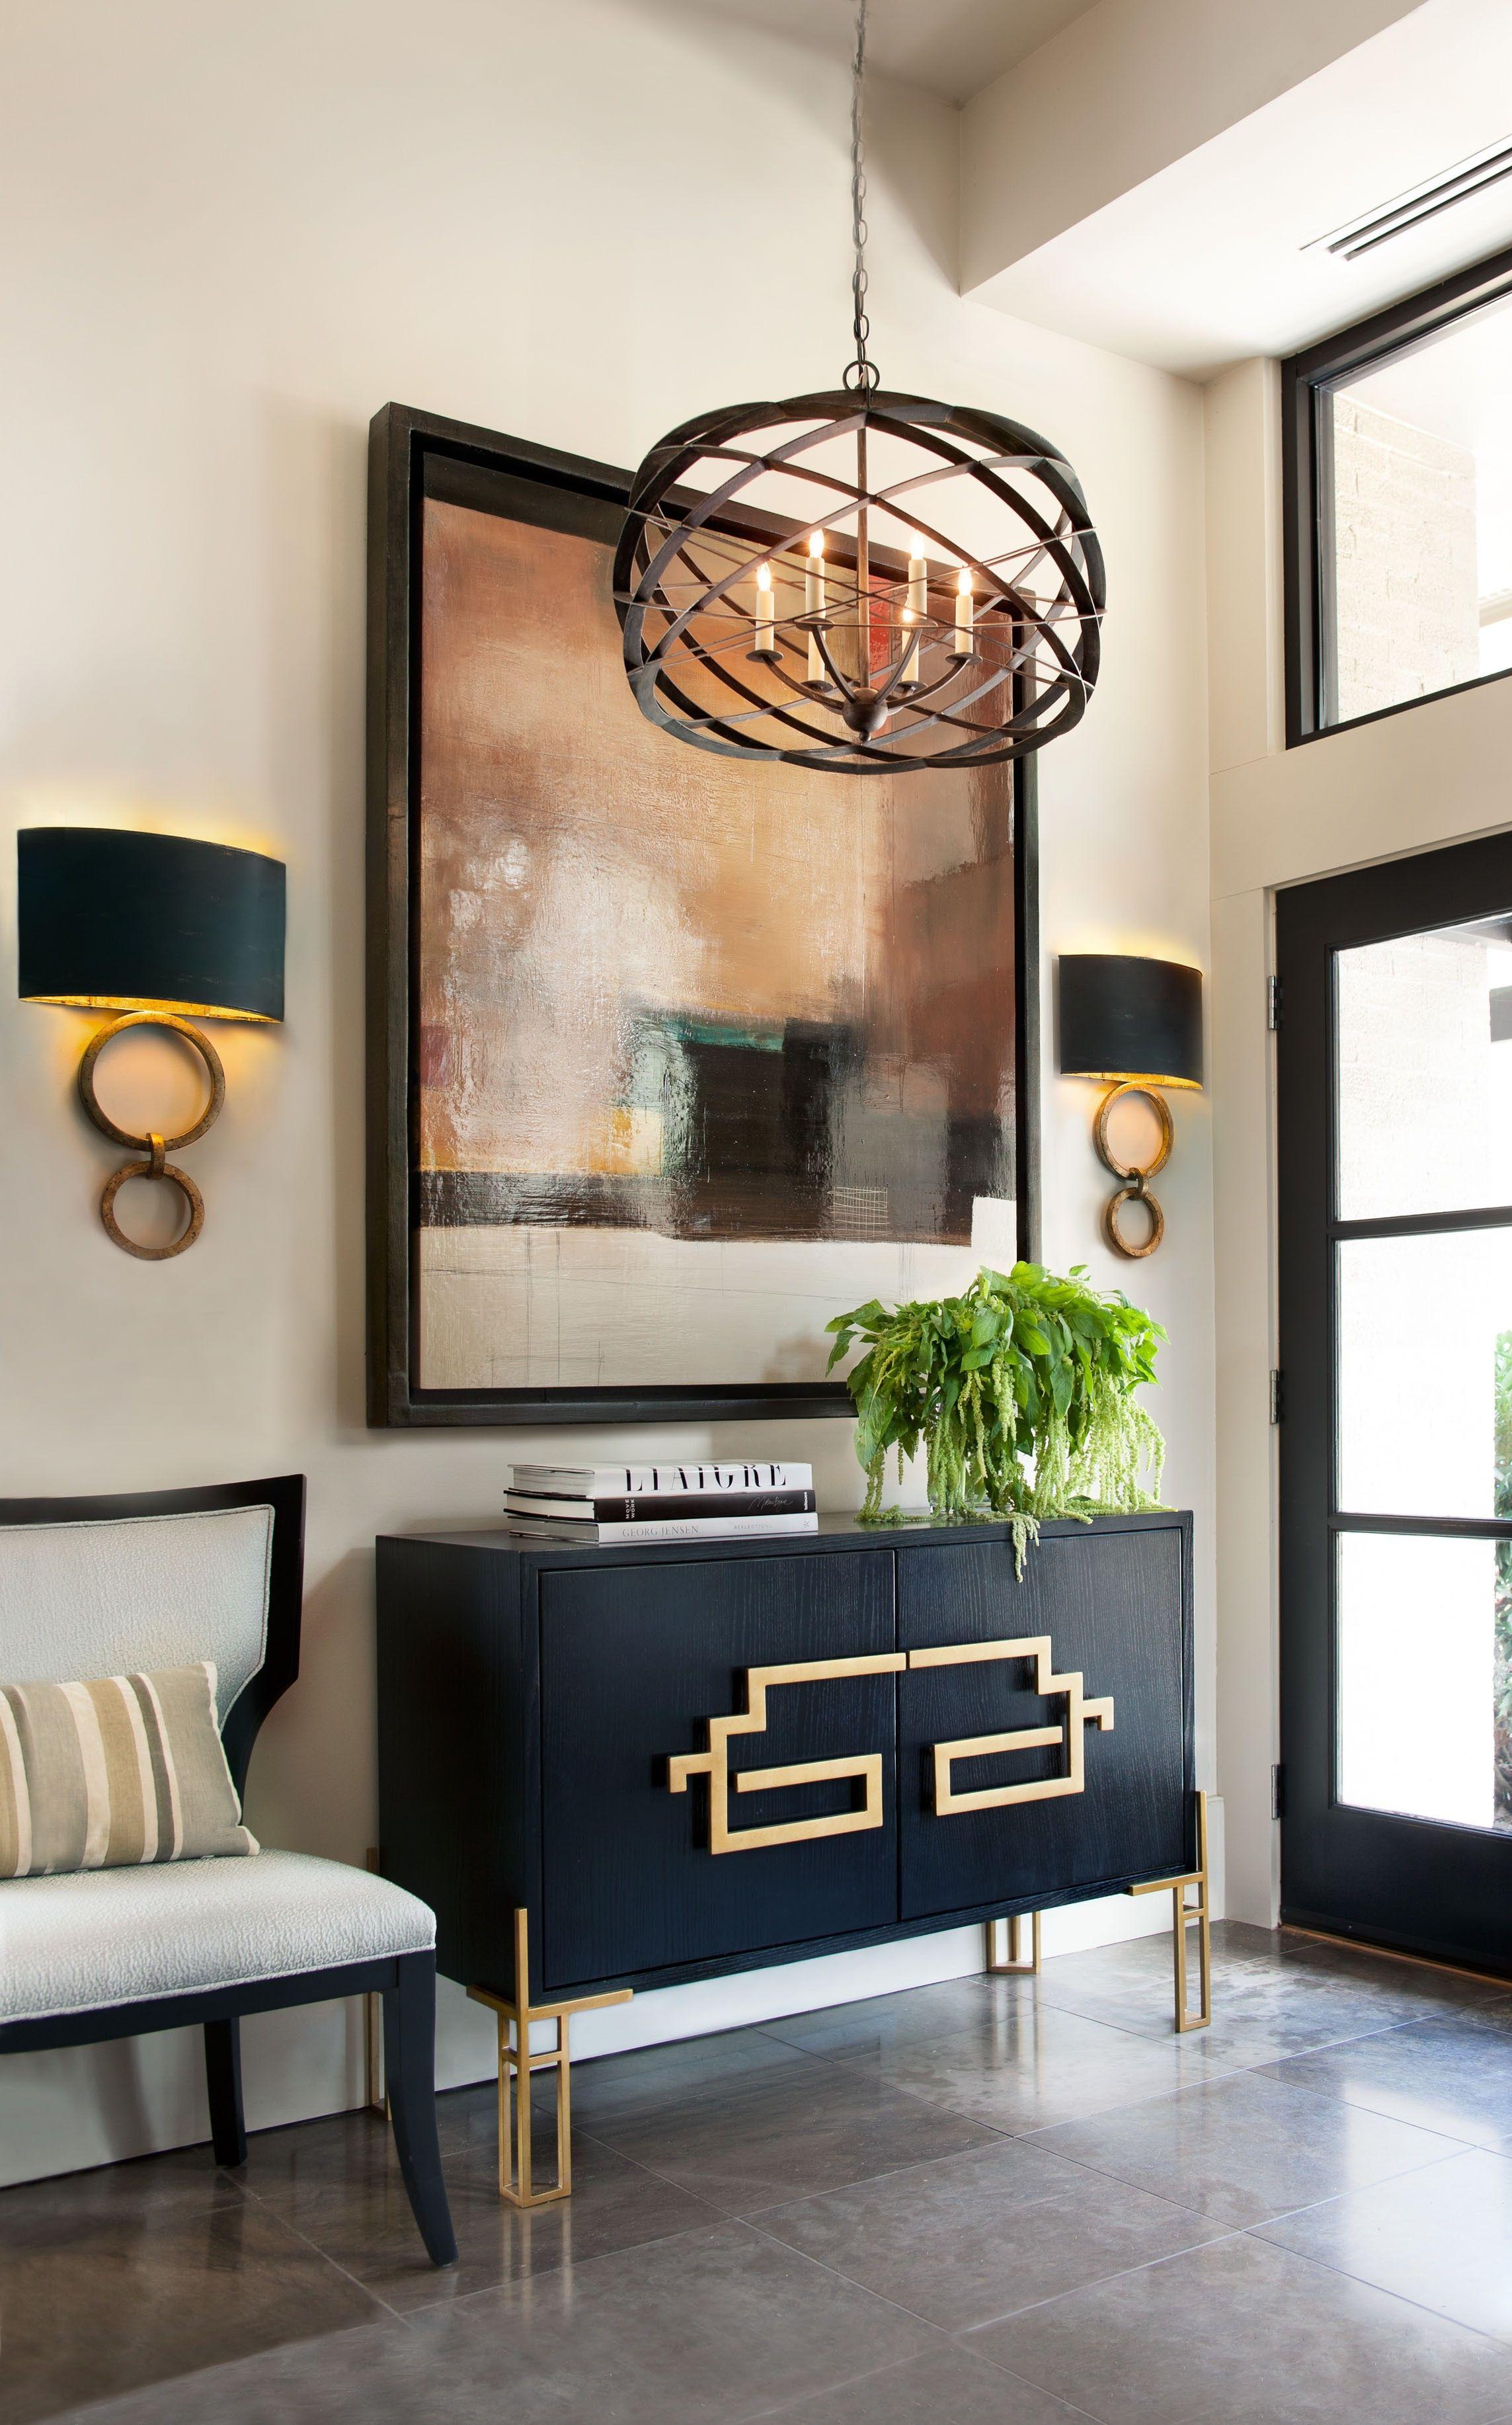 Bolebrook Wall Light By Currey And Company 5910 Cc Gold Living Room Decor Home Decor